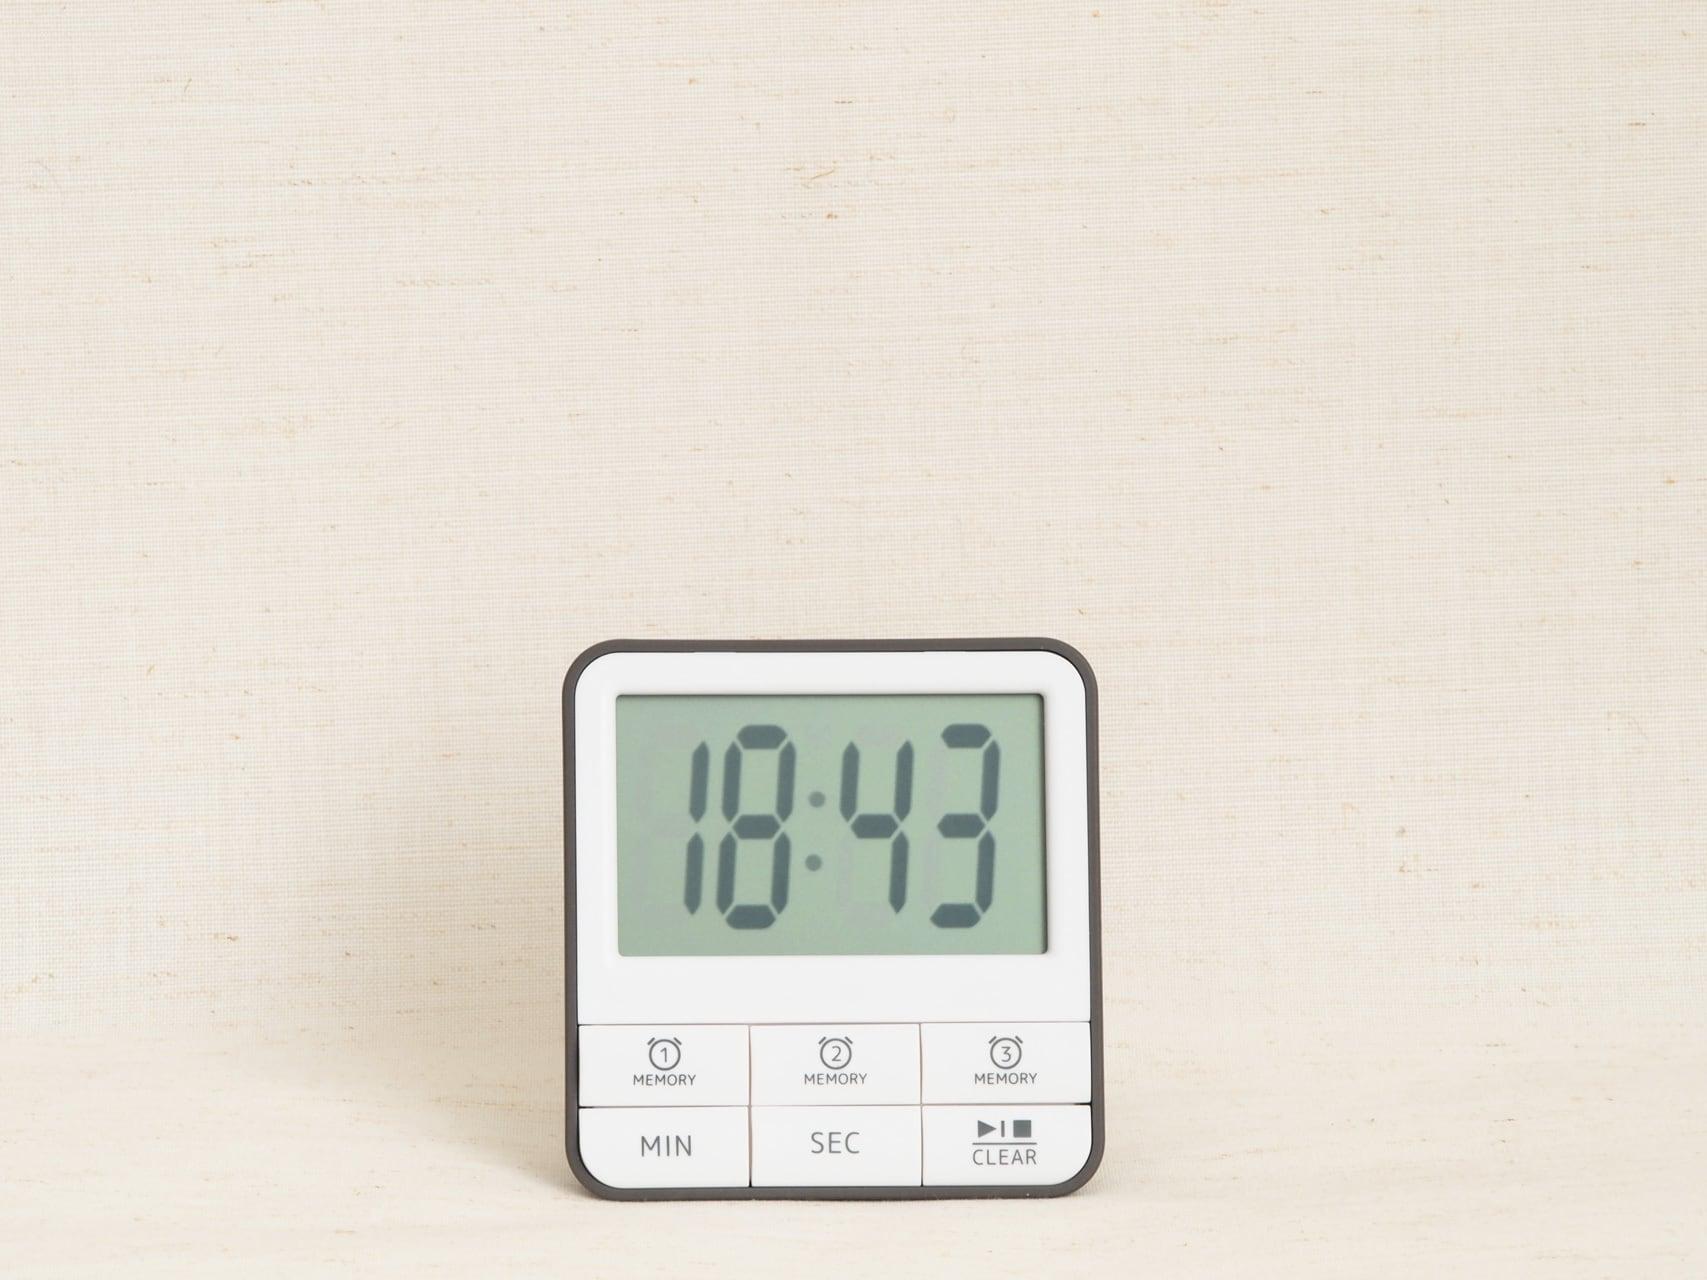 HAKARU ハカル / キッチンタイマー Memo-Clock timer メモクロックタイマー ホワイトグレー KT162